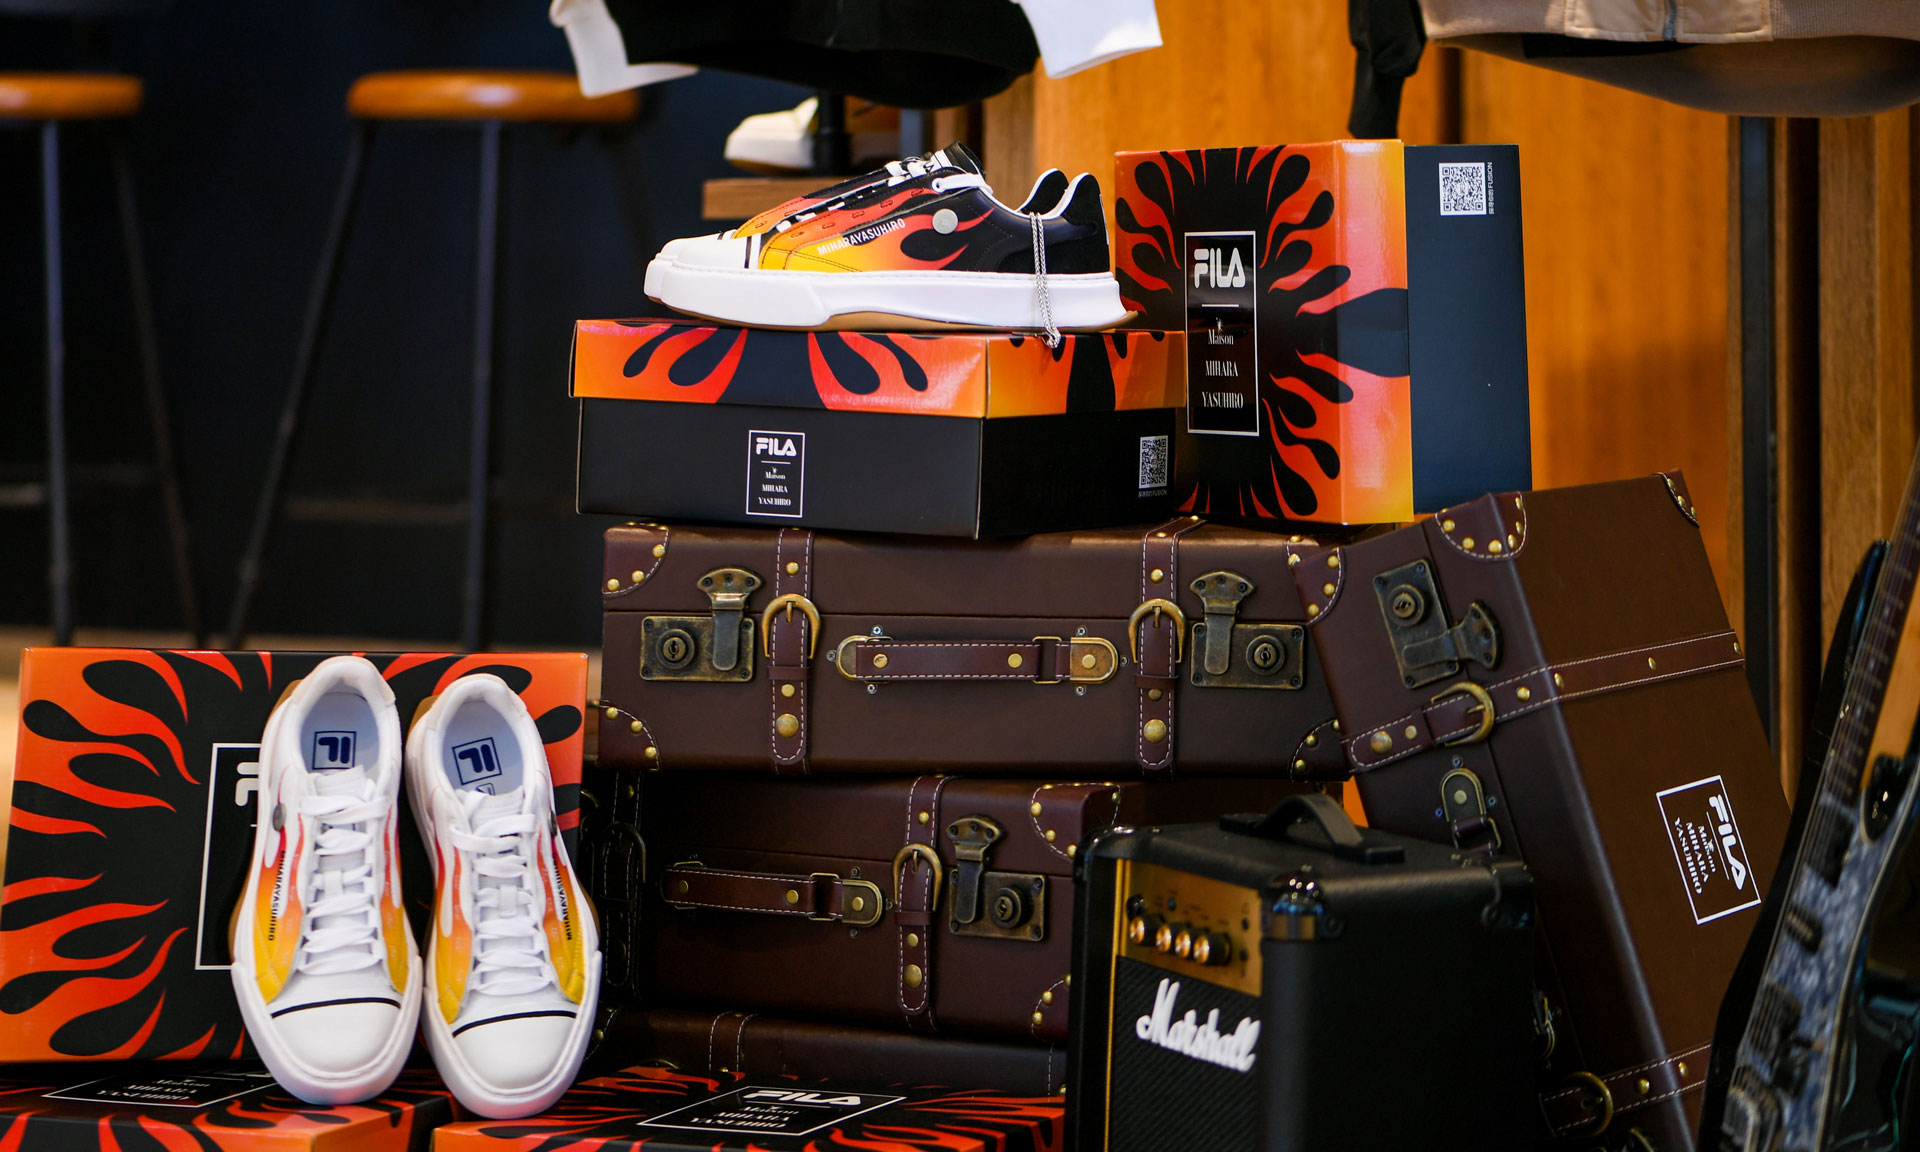 FILA FUSION x Maison MIHARA YASUHIRO FM-5 FLAME 超限定鞋款发售